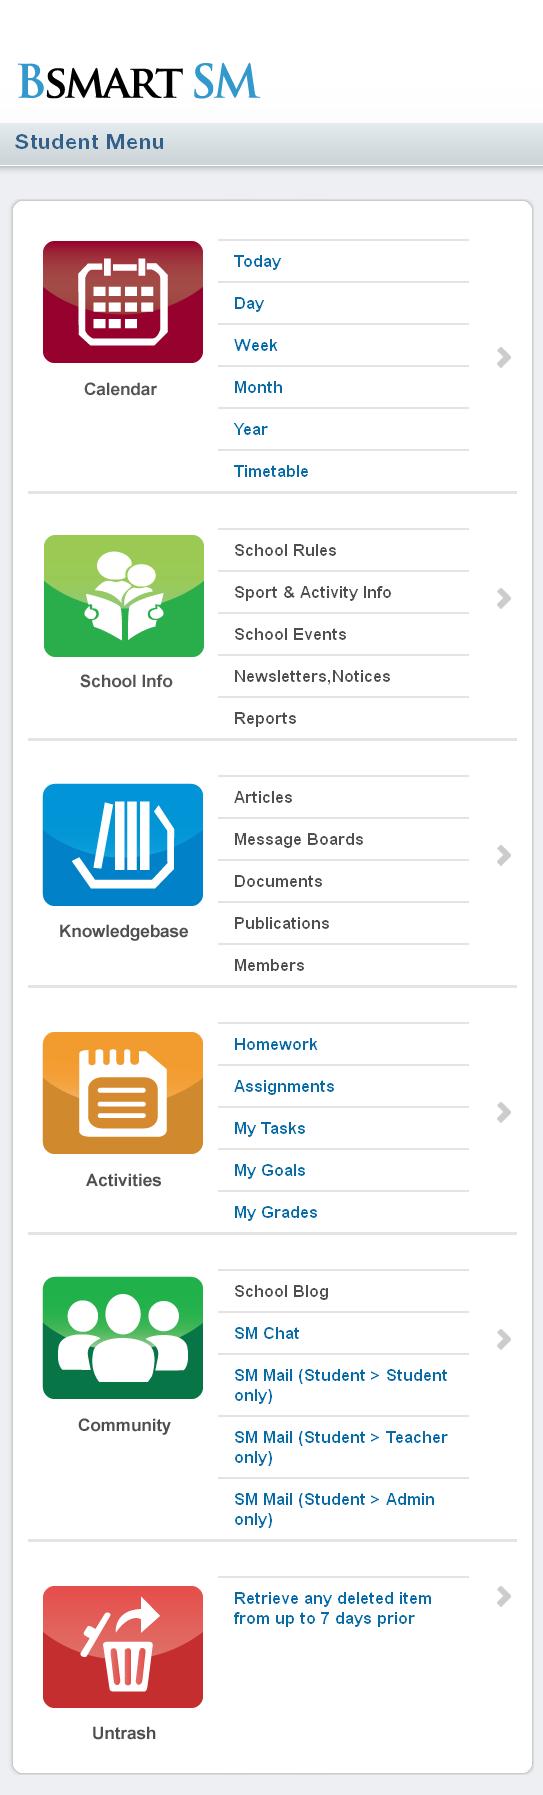 Dot Net Website for Education 'BSMART SM' – Teachers & Students Portal